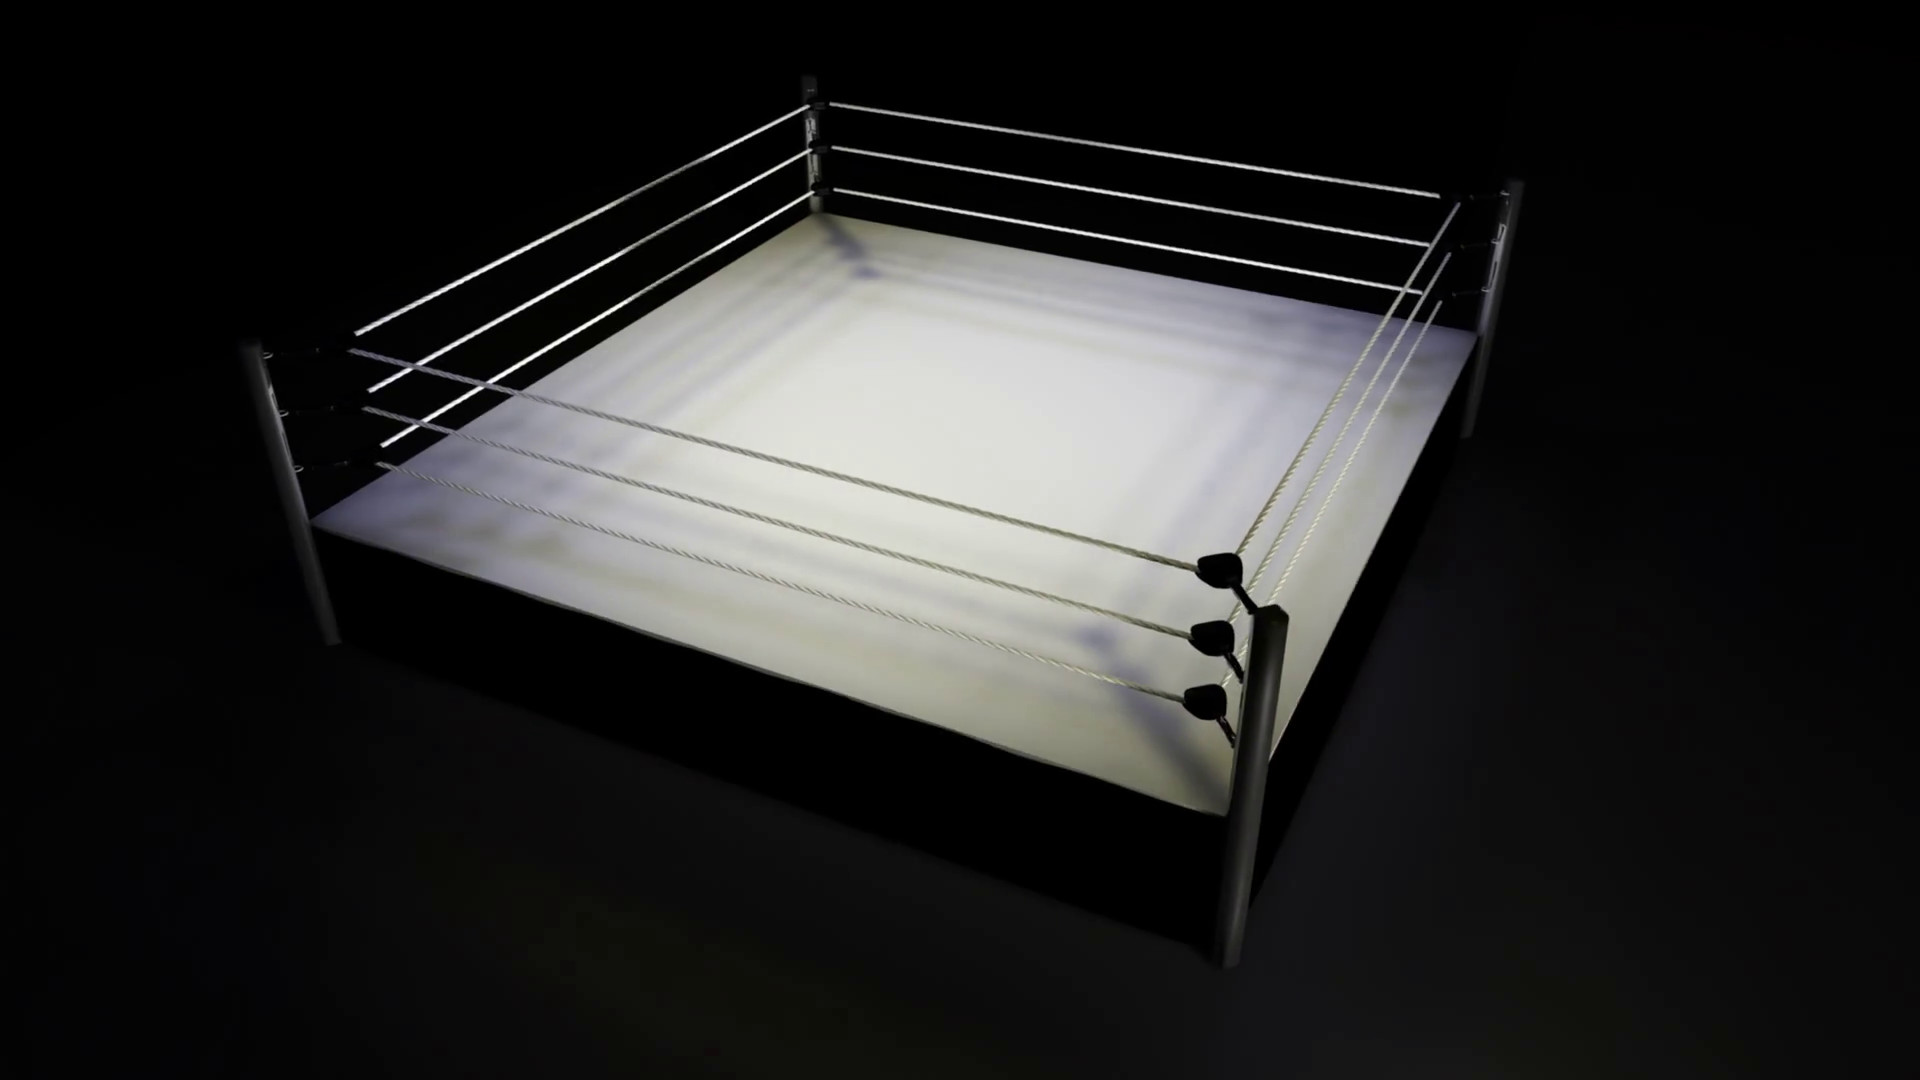 1920x1080 Rotating Boxing Wrestling Ring On Black Background Motion